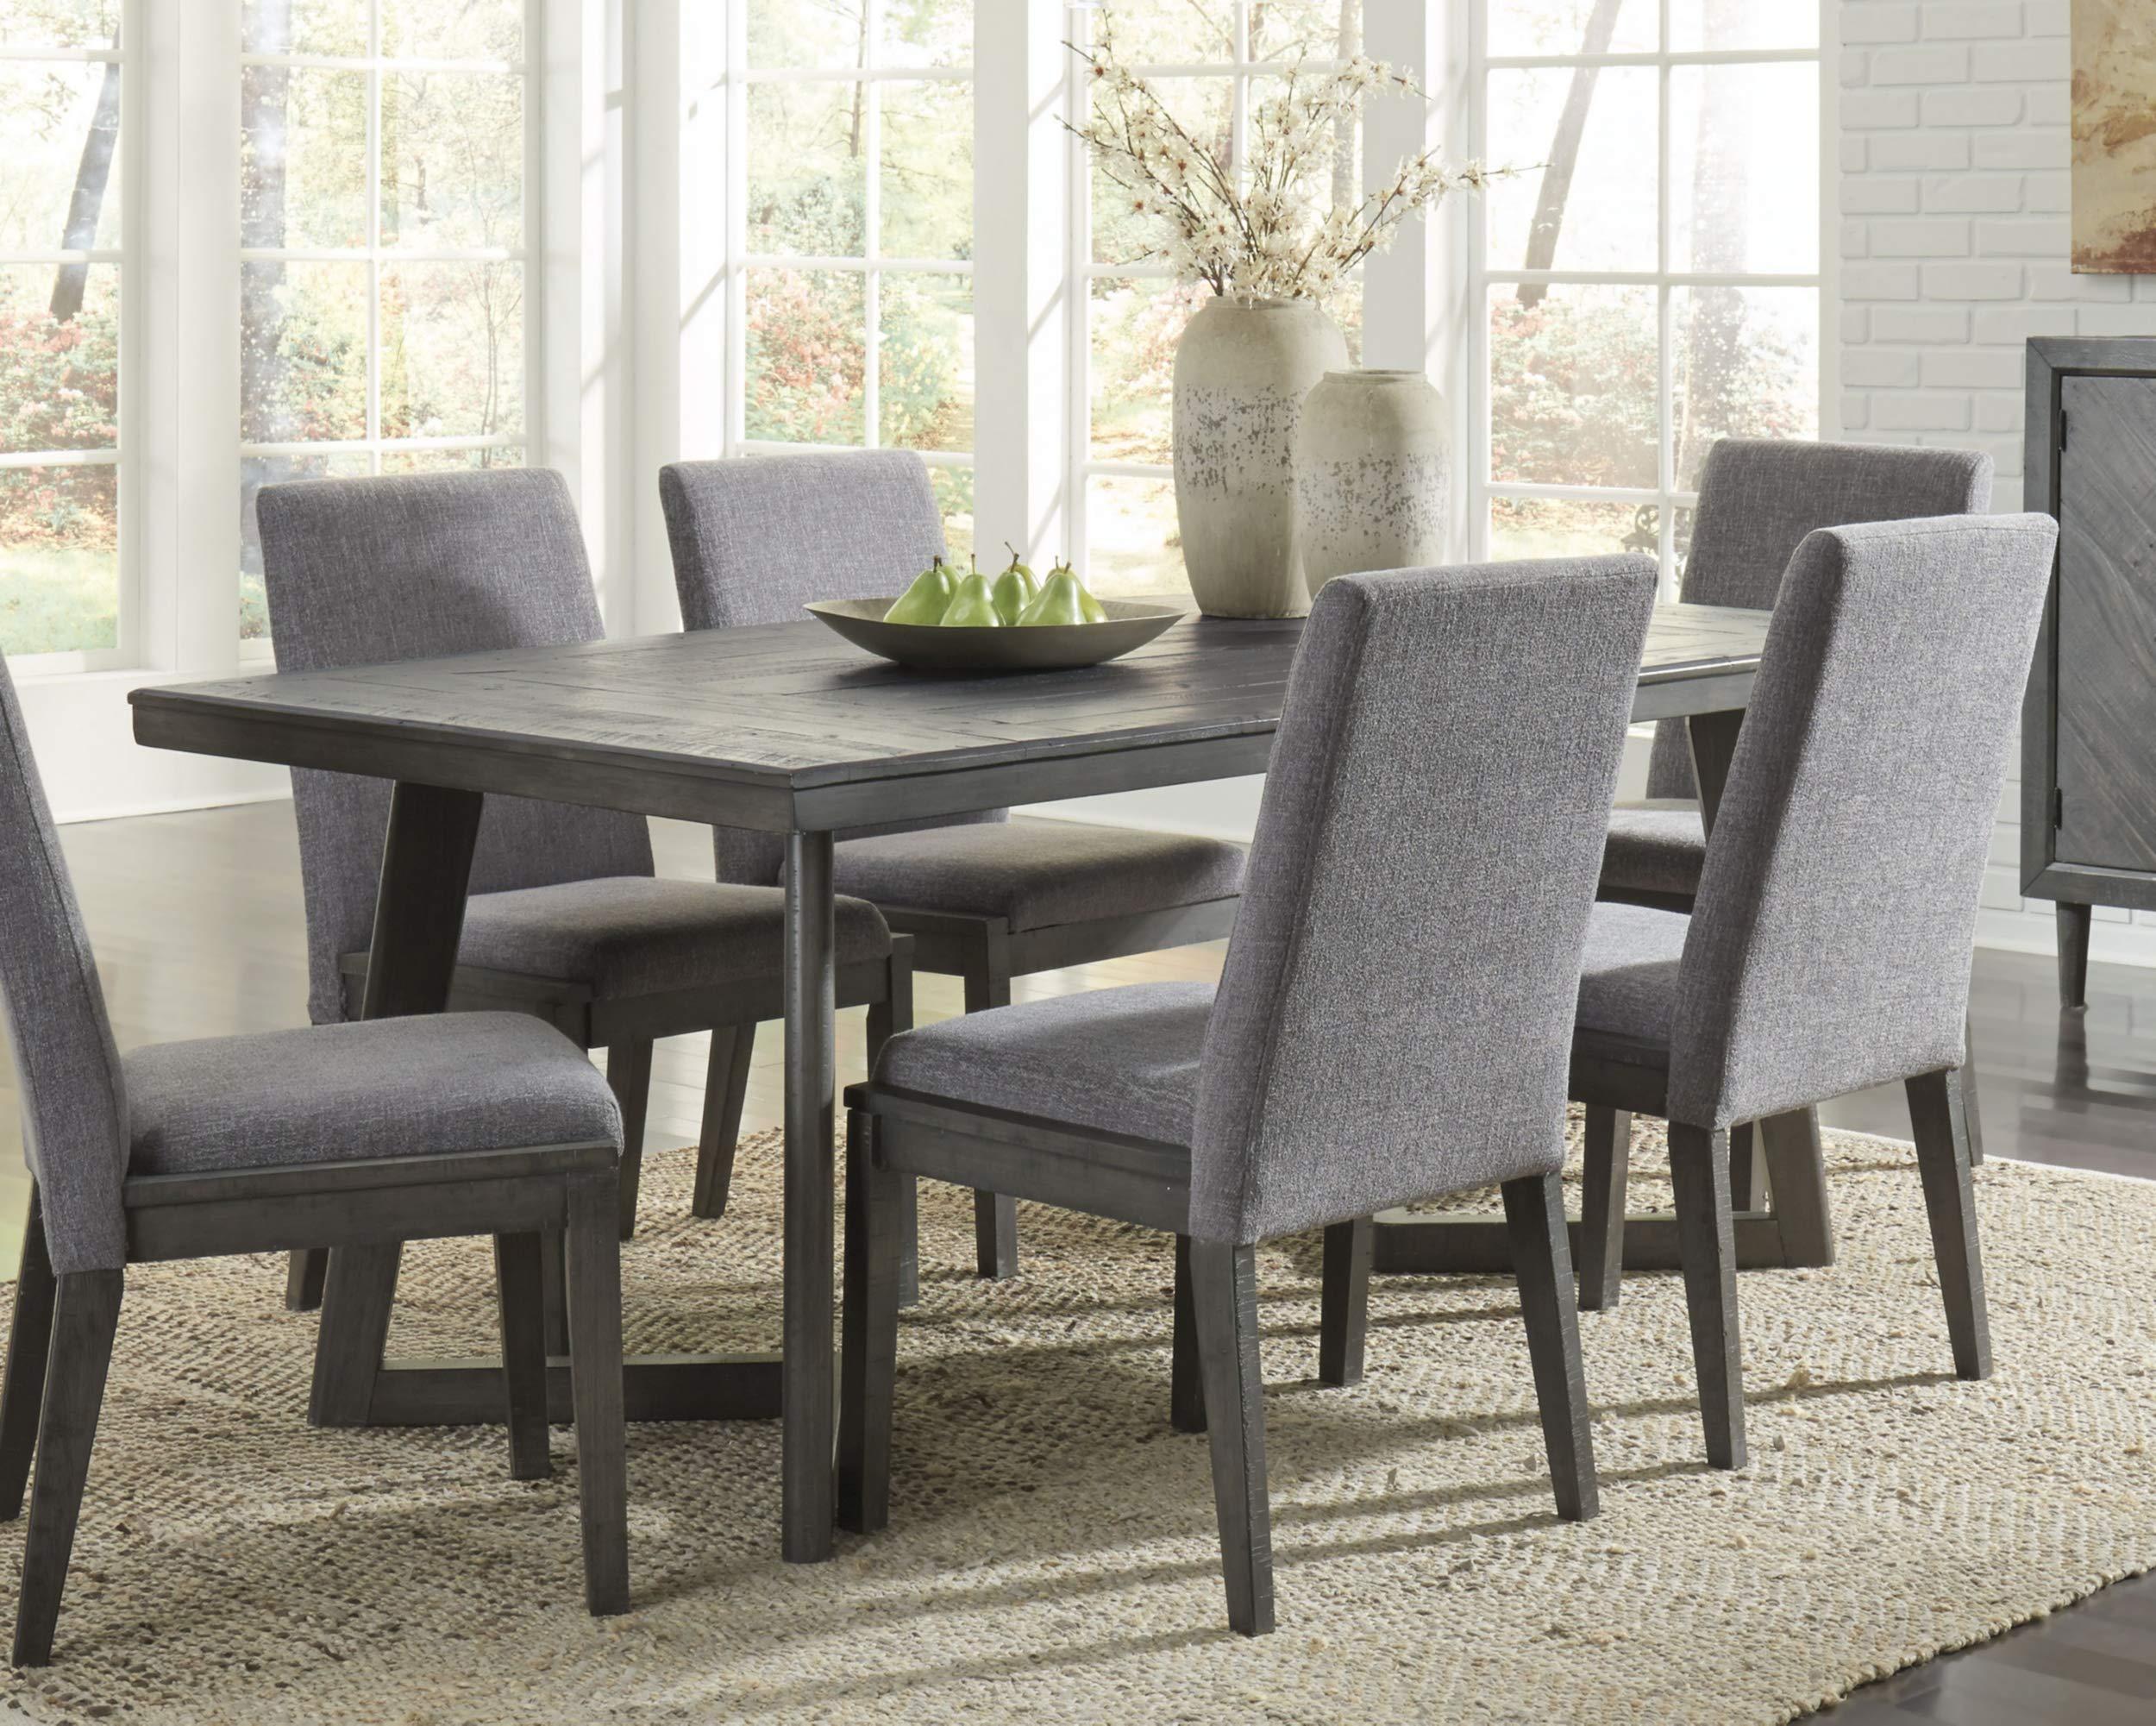 Signature Design By Ashley - Besteneer Rectangular Dining Room Table - Contemporary Style - Dark Gray by Signature Design by Ashley